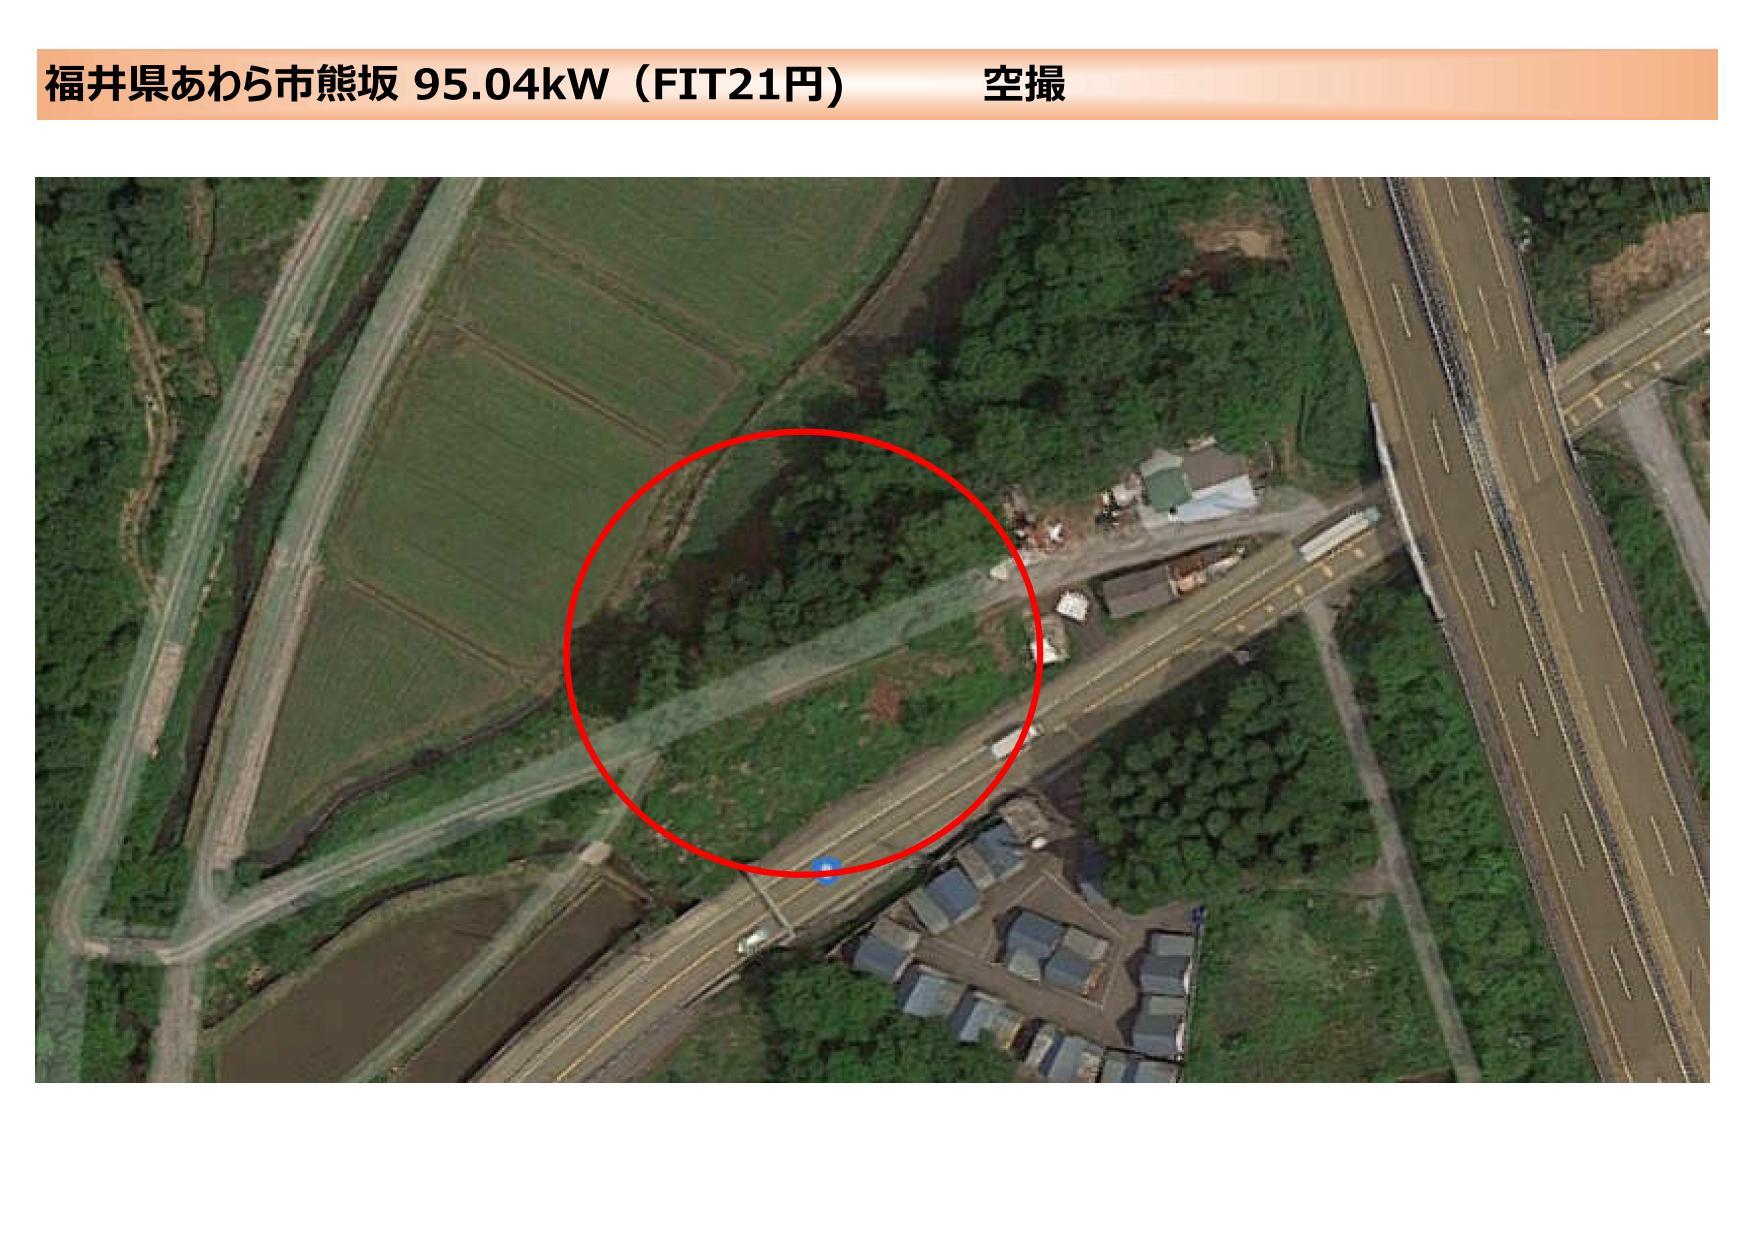 【SB】FIT21円 福井県あわら市熊坂発電所②のメイン画像